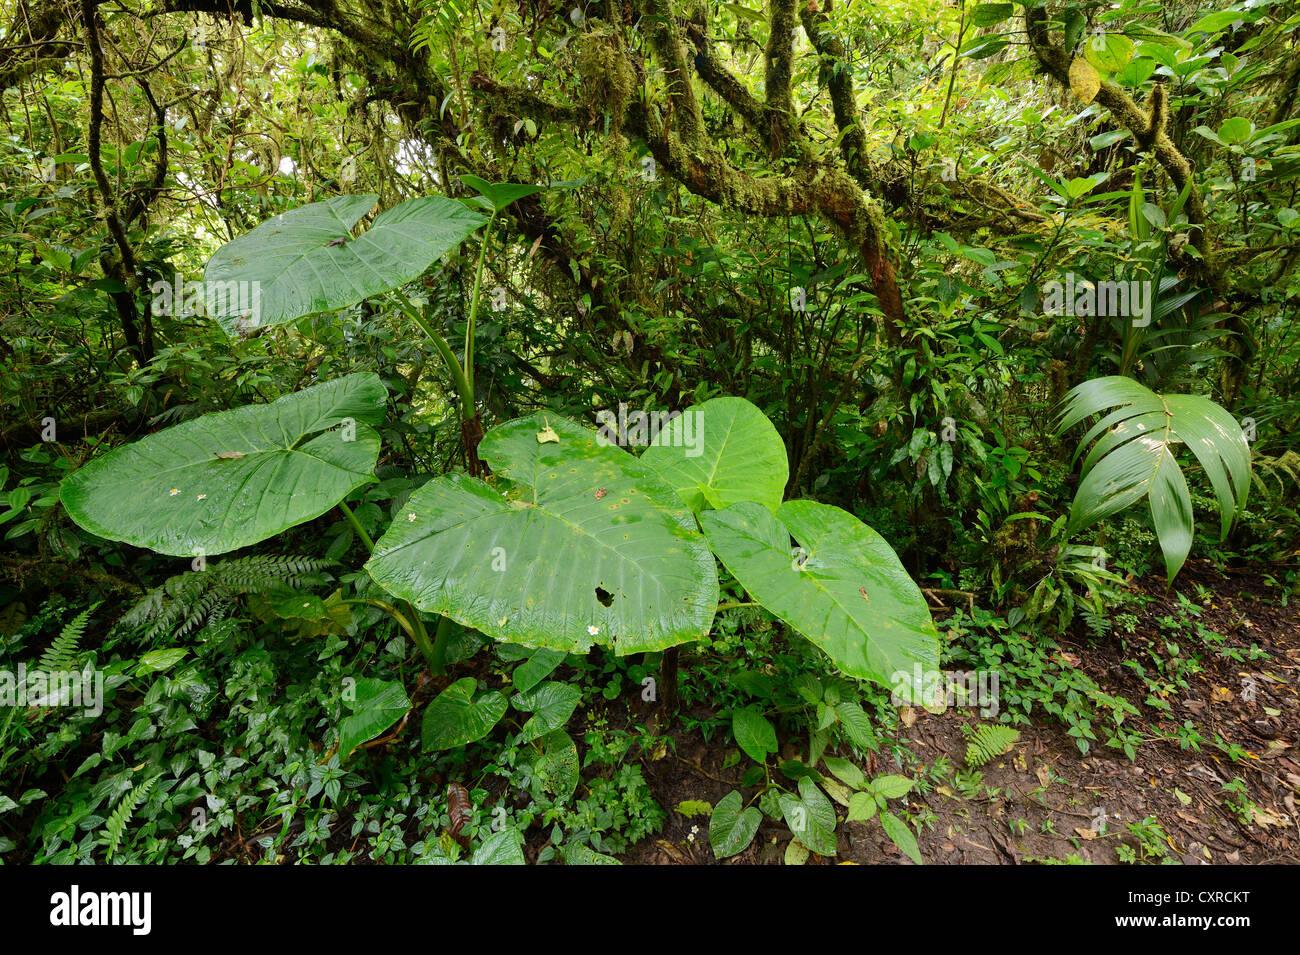 Shaving brush plant (Haemanthus albiflos) in Monteverde, Costa Rica, Central America - Stock Image